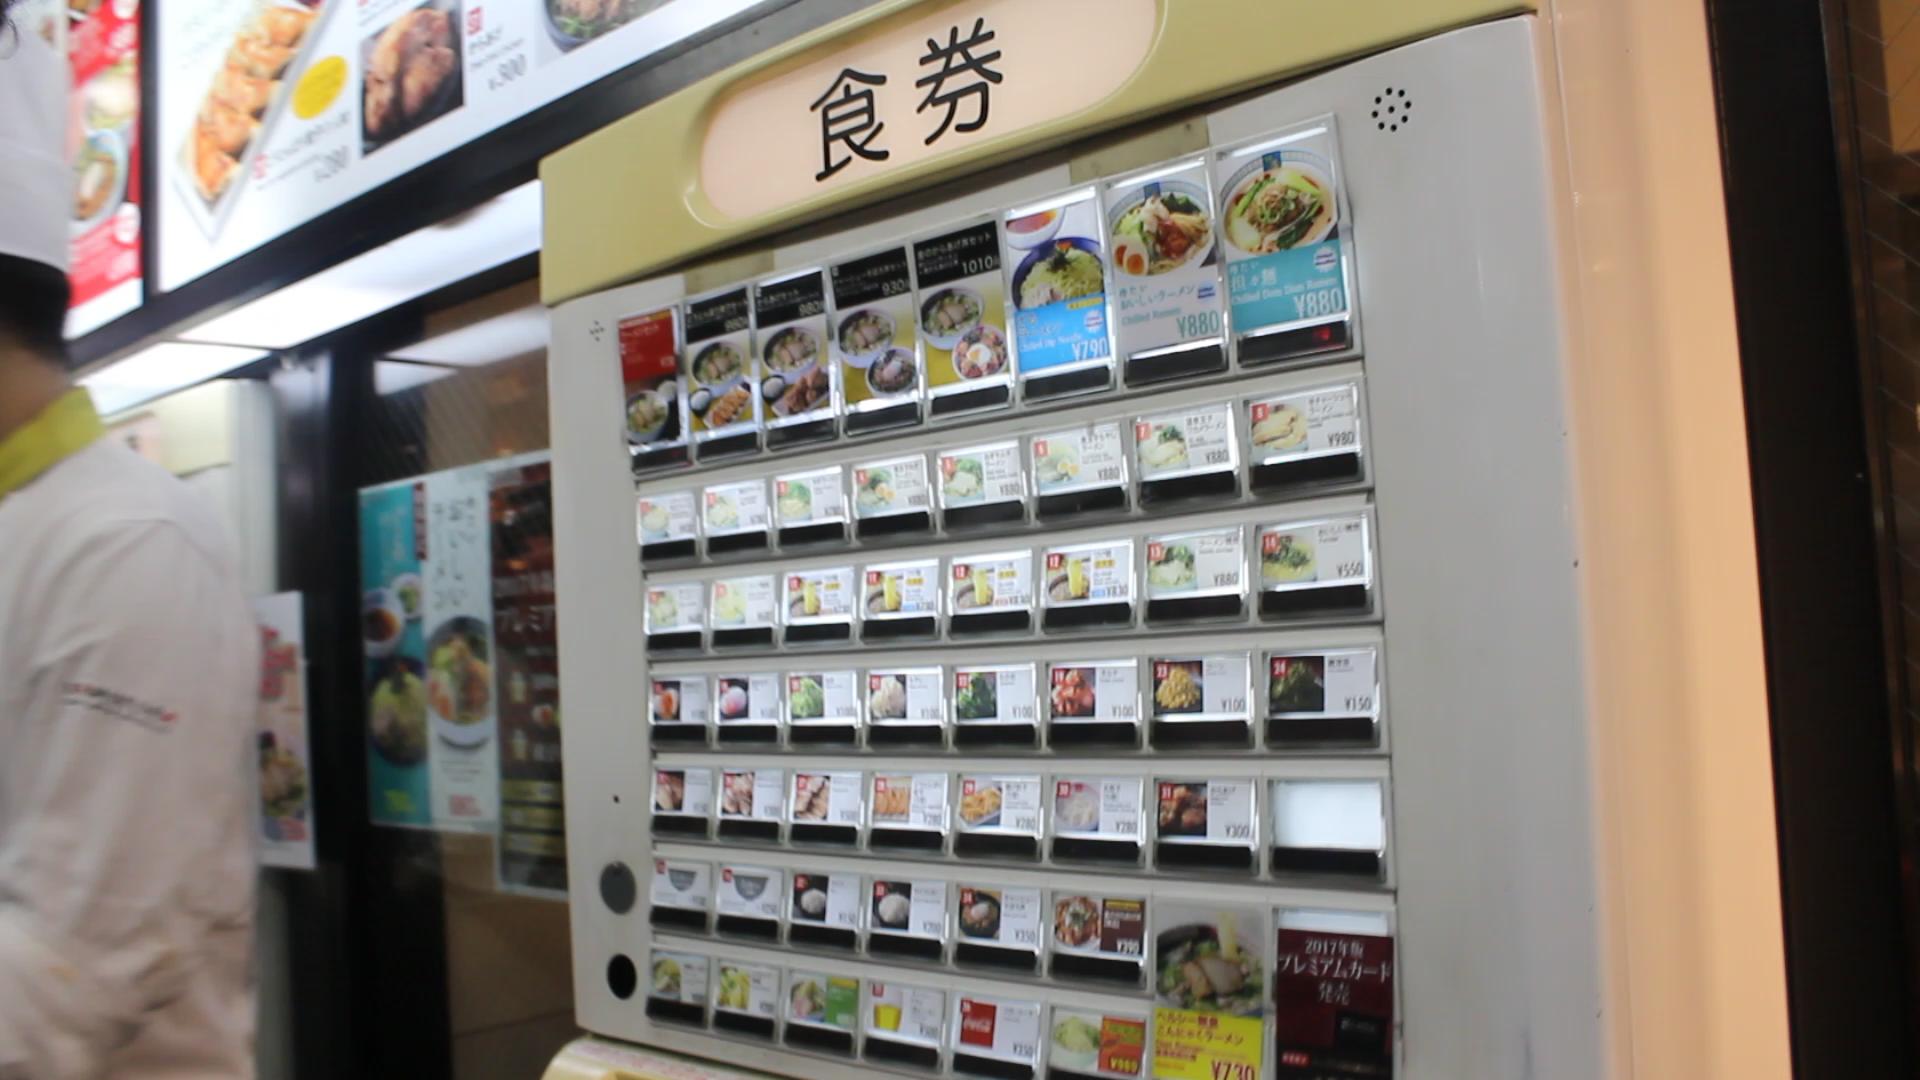 máquina comida tokyo 2